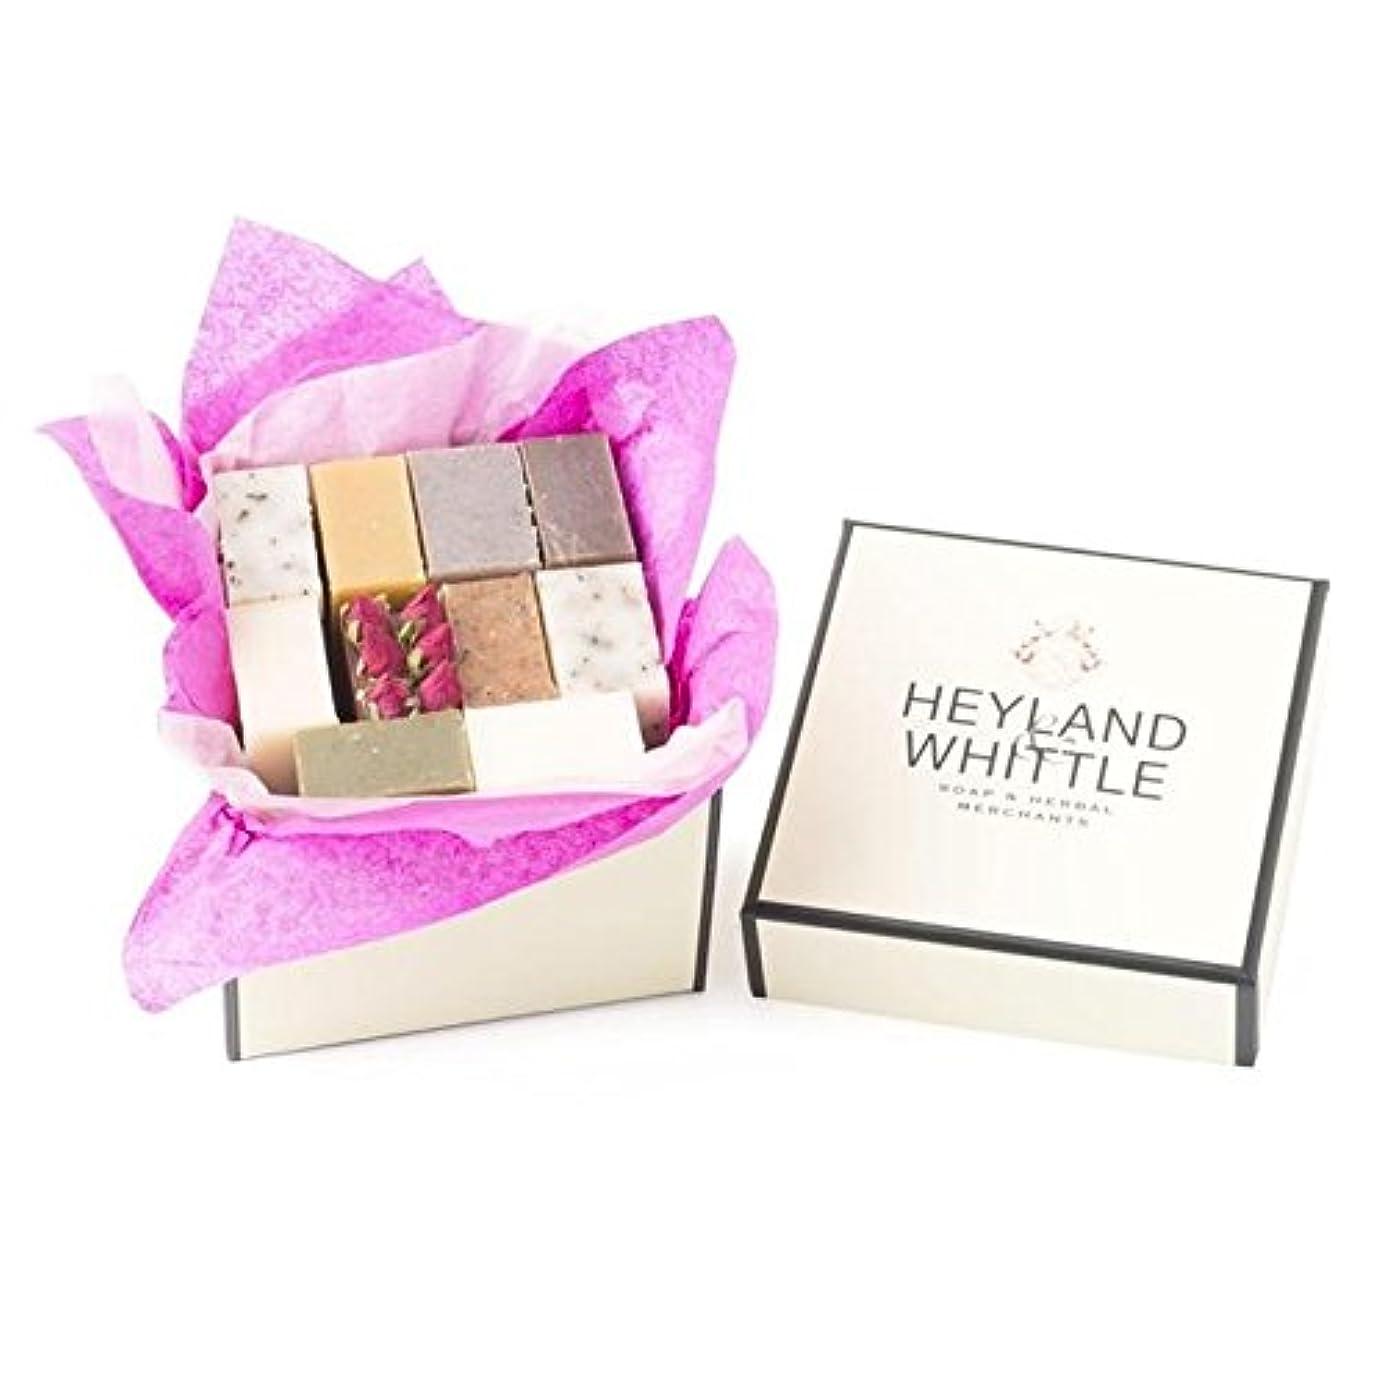 Heyland & Whittle Soap Gift Box, Small - 小さな&削るソープギフトボックス、 [並行輸入品]